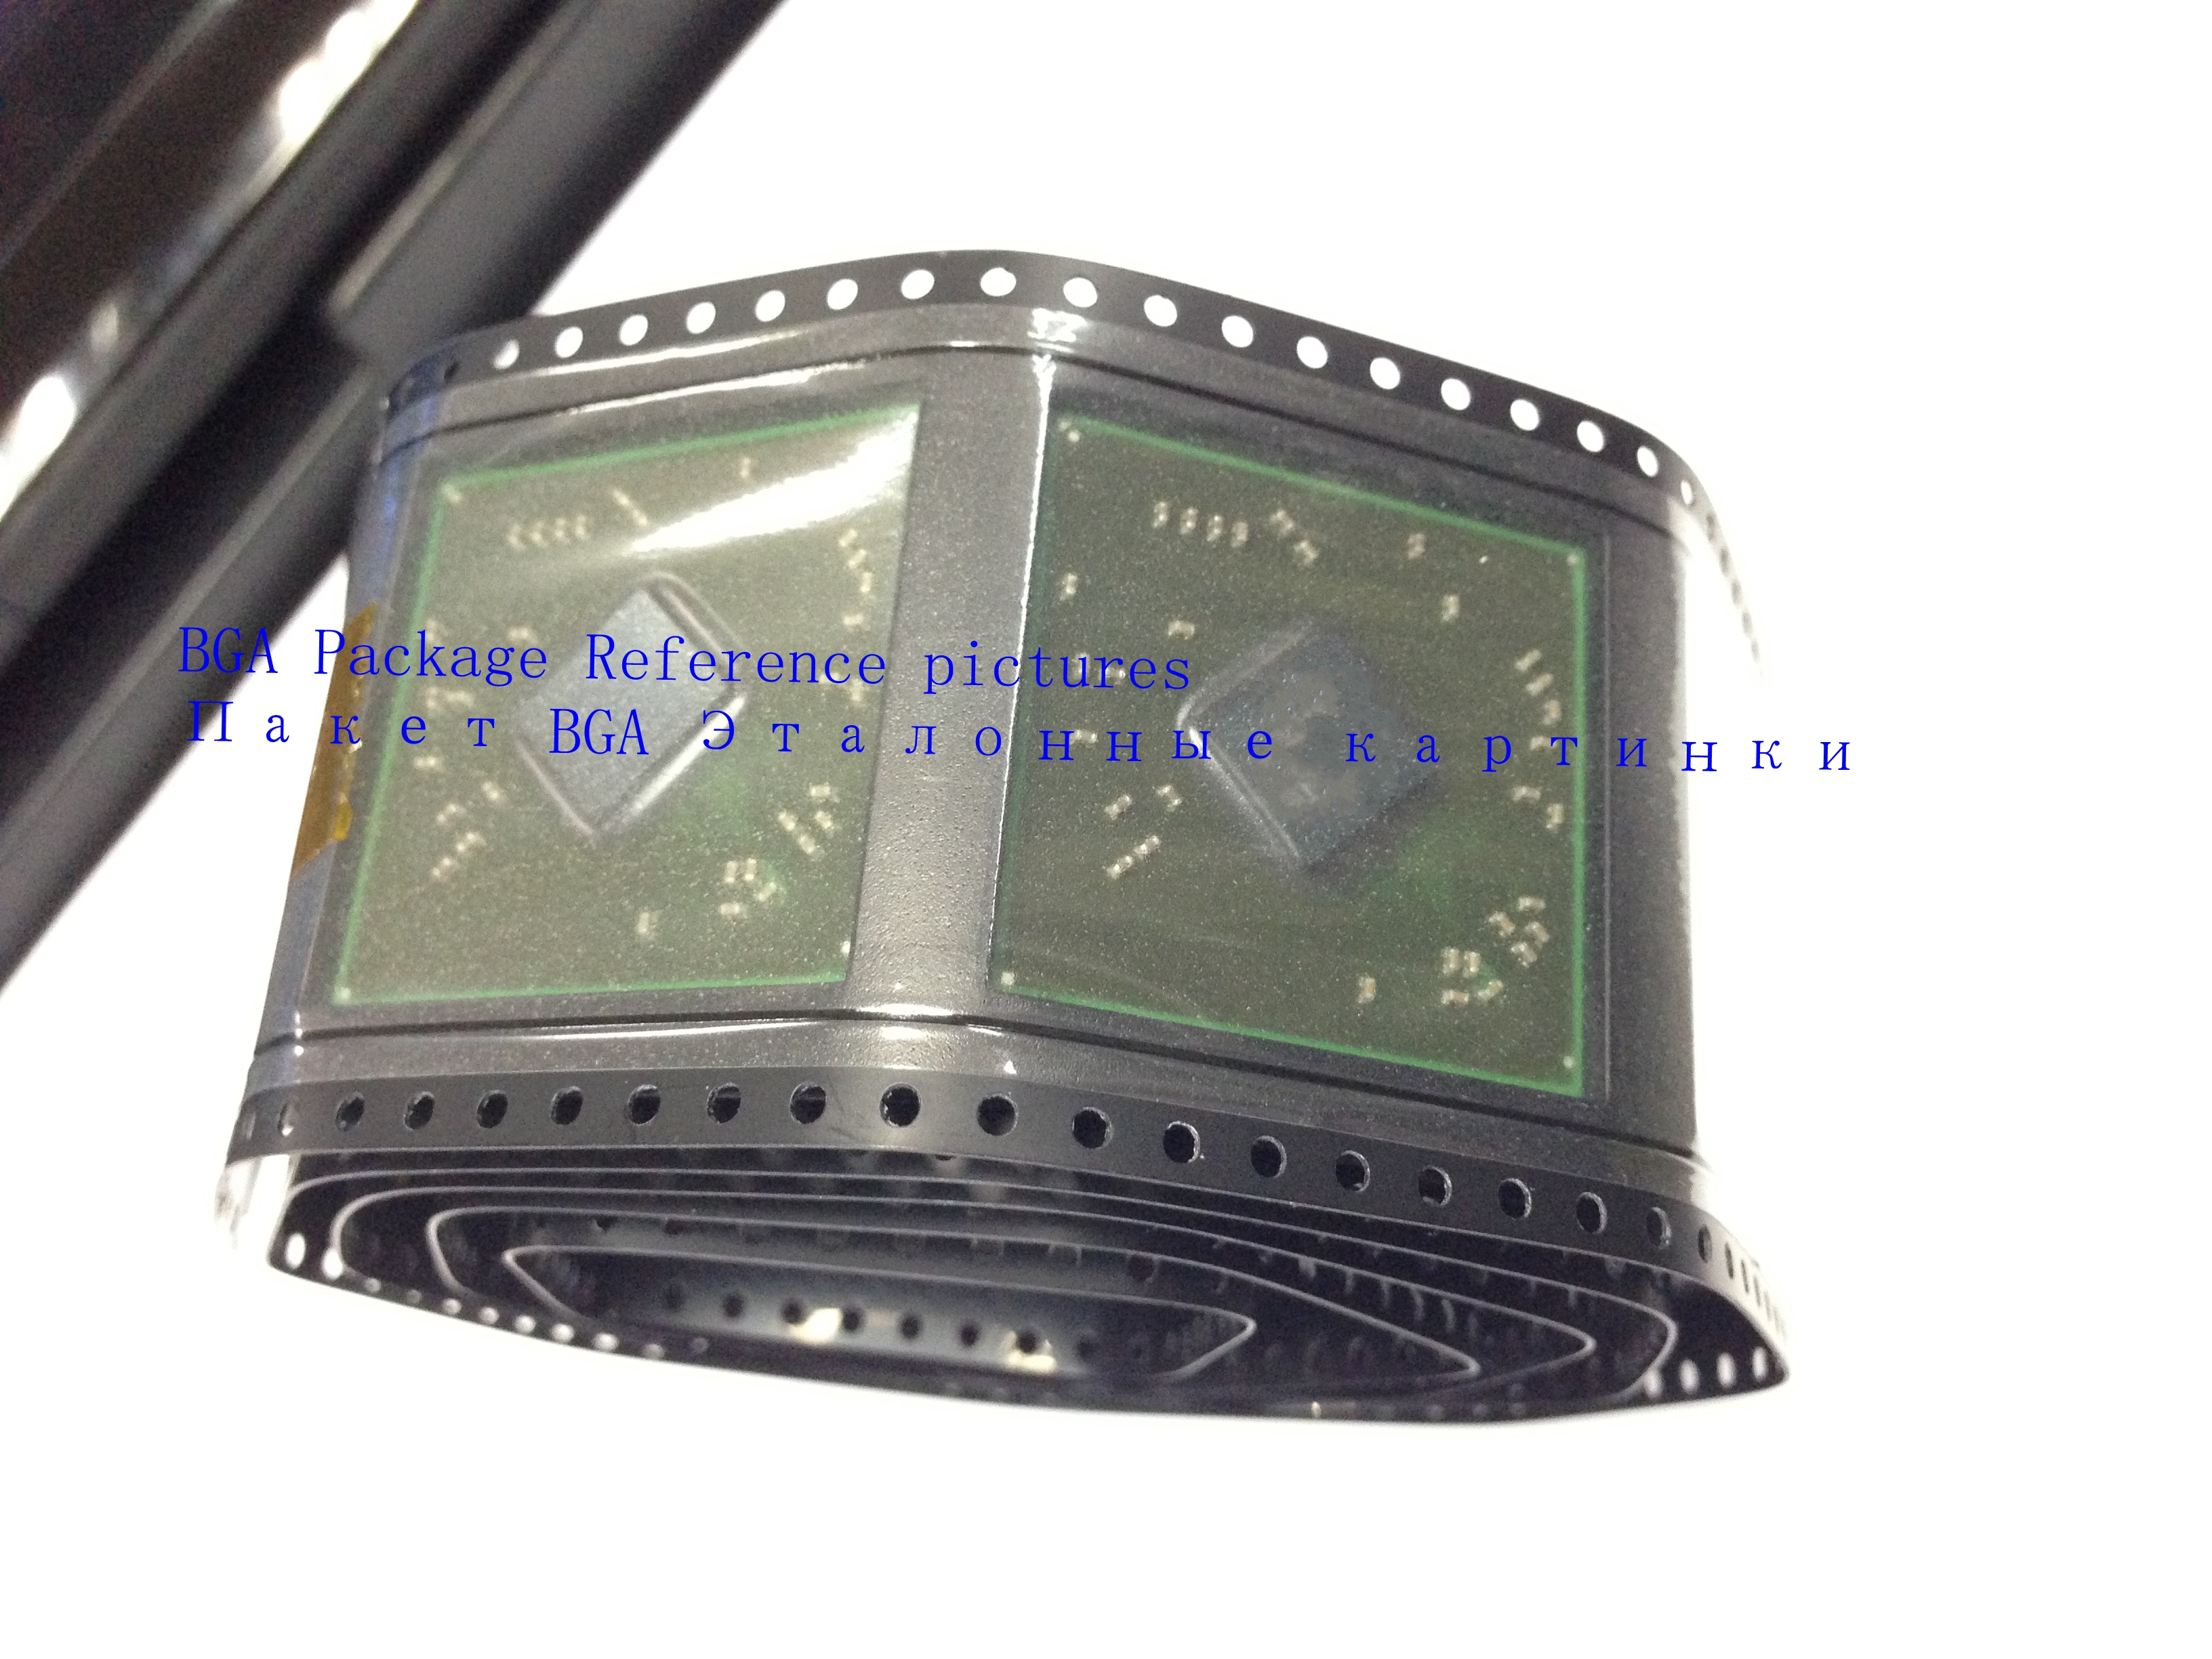 1 pcs/lot 100% Nouveau MCP75L-B3 MCP75L B3 Chipset BGA1 pcs/lot 100% Nouveau MCP75L-B3 MCP75L B3 Chipset BGA